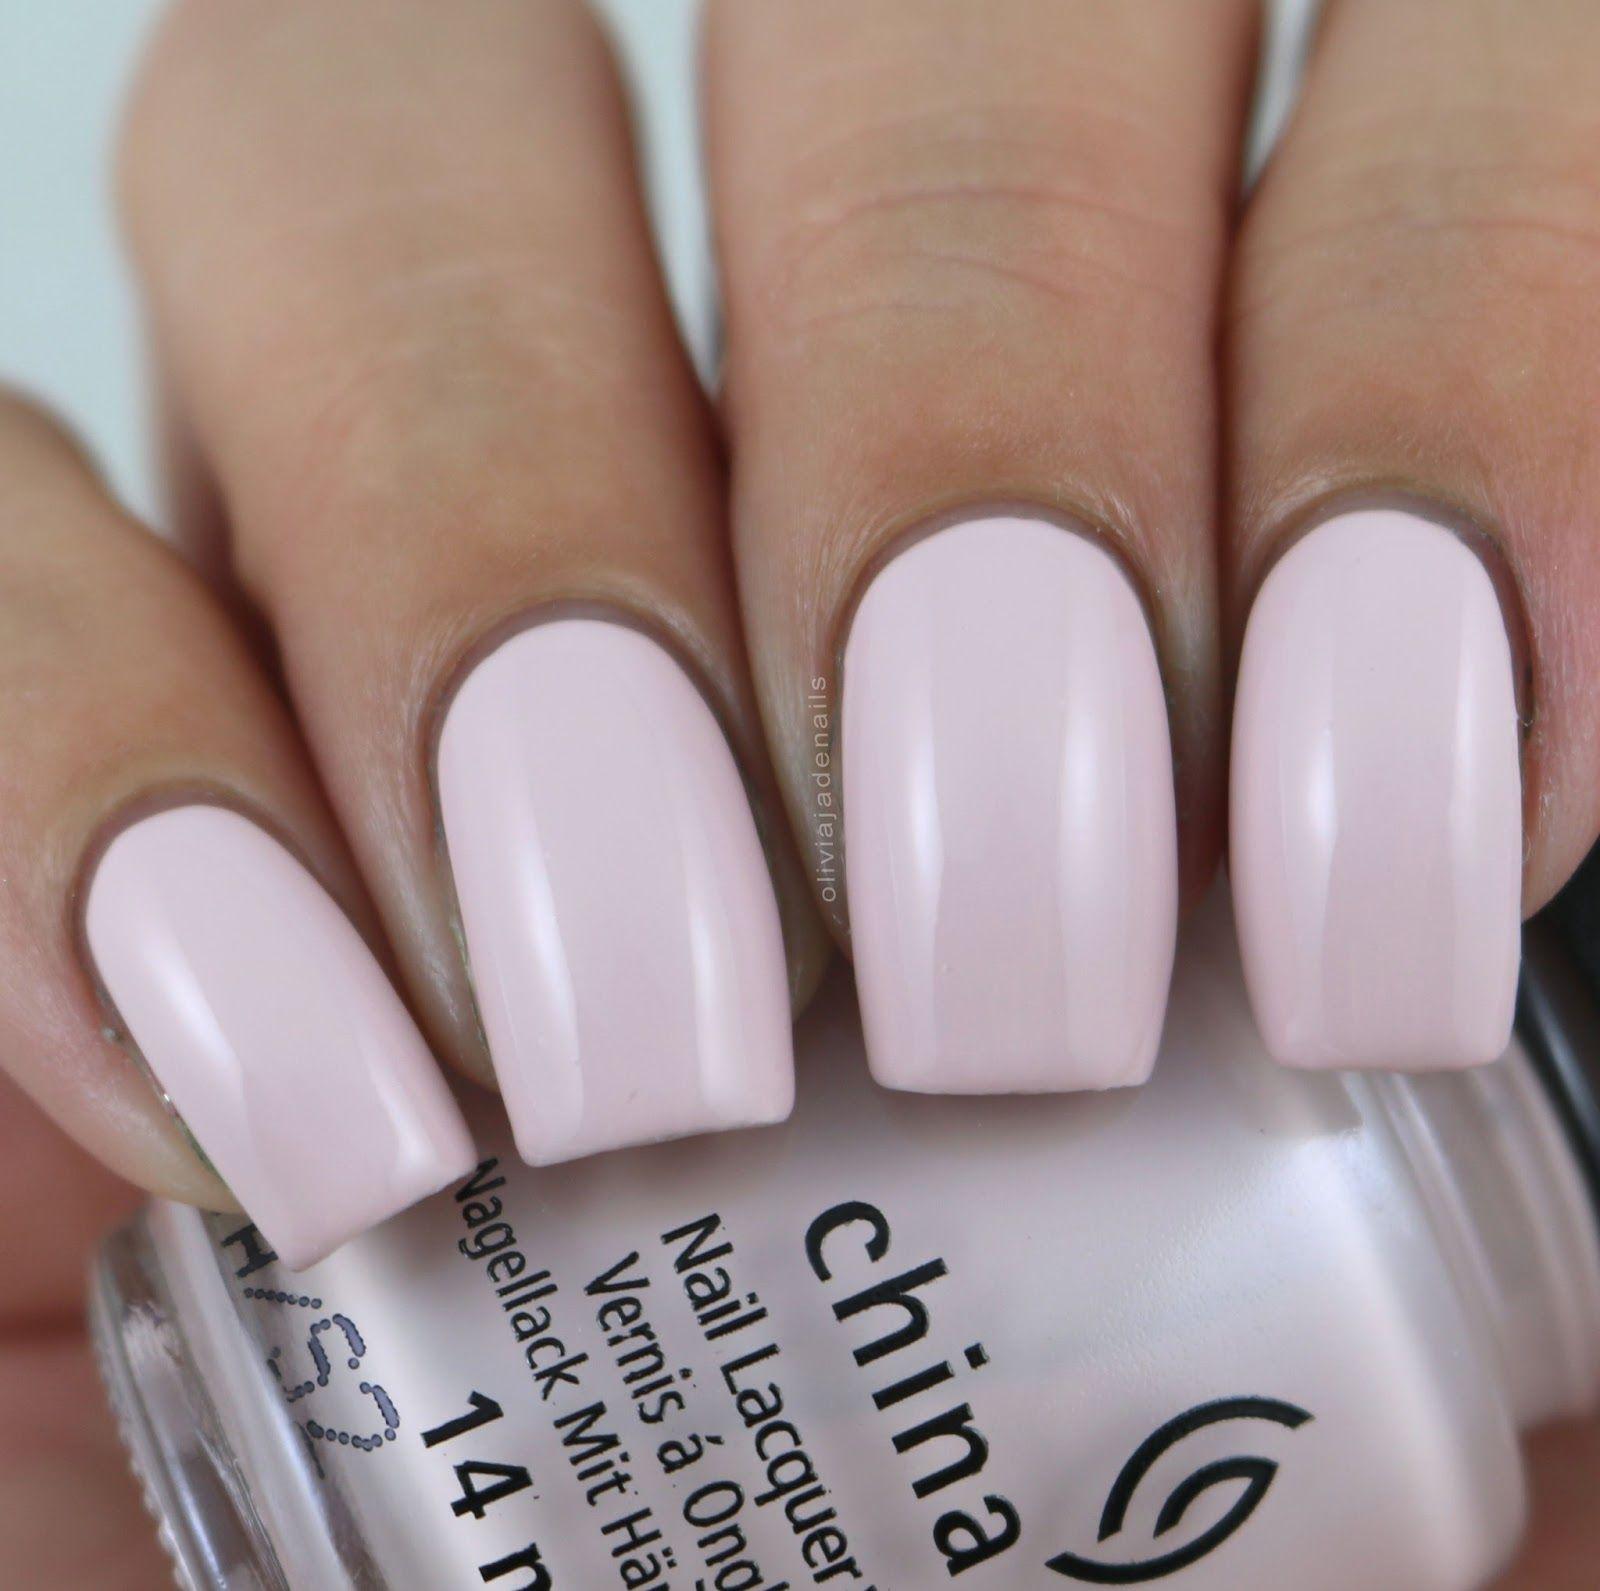 China Glaze Nail Polish Colors List - AccessoryWiz